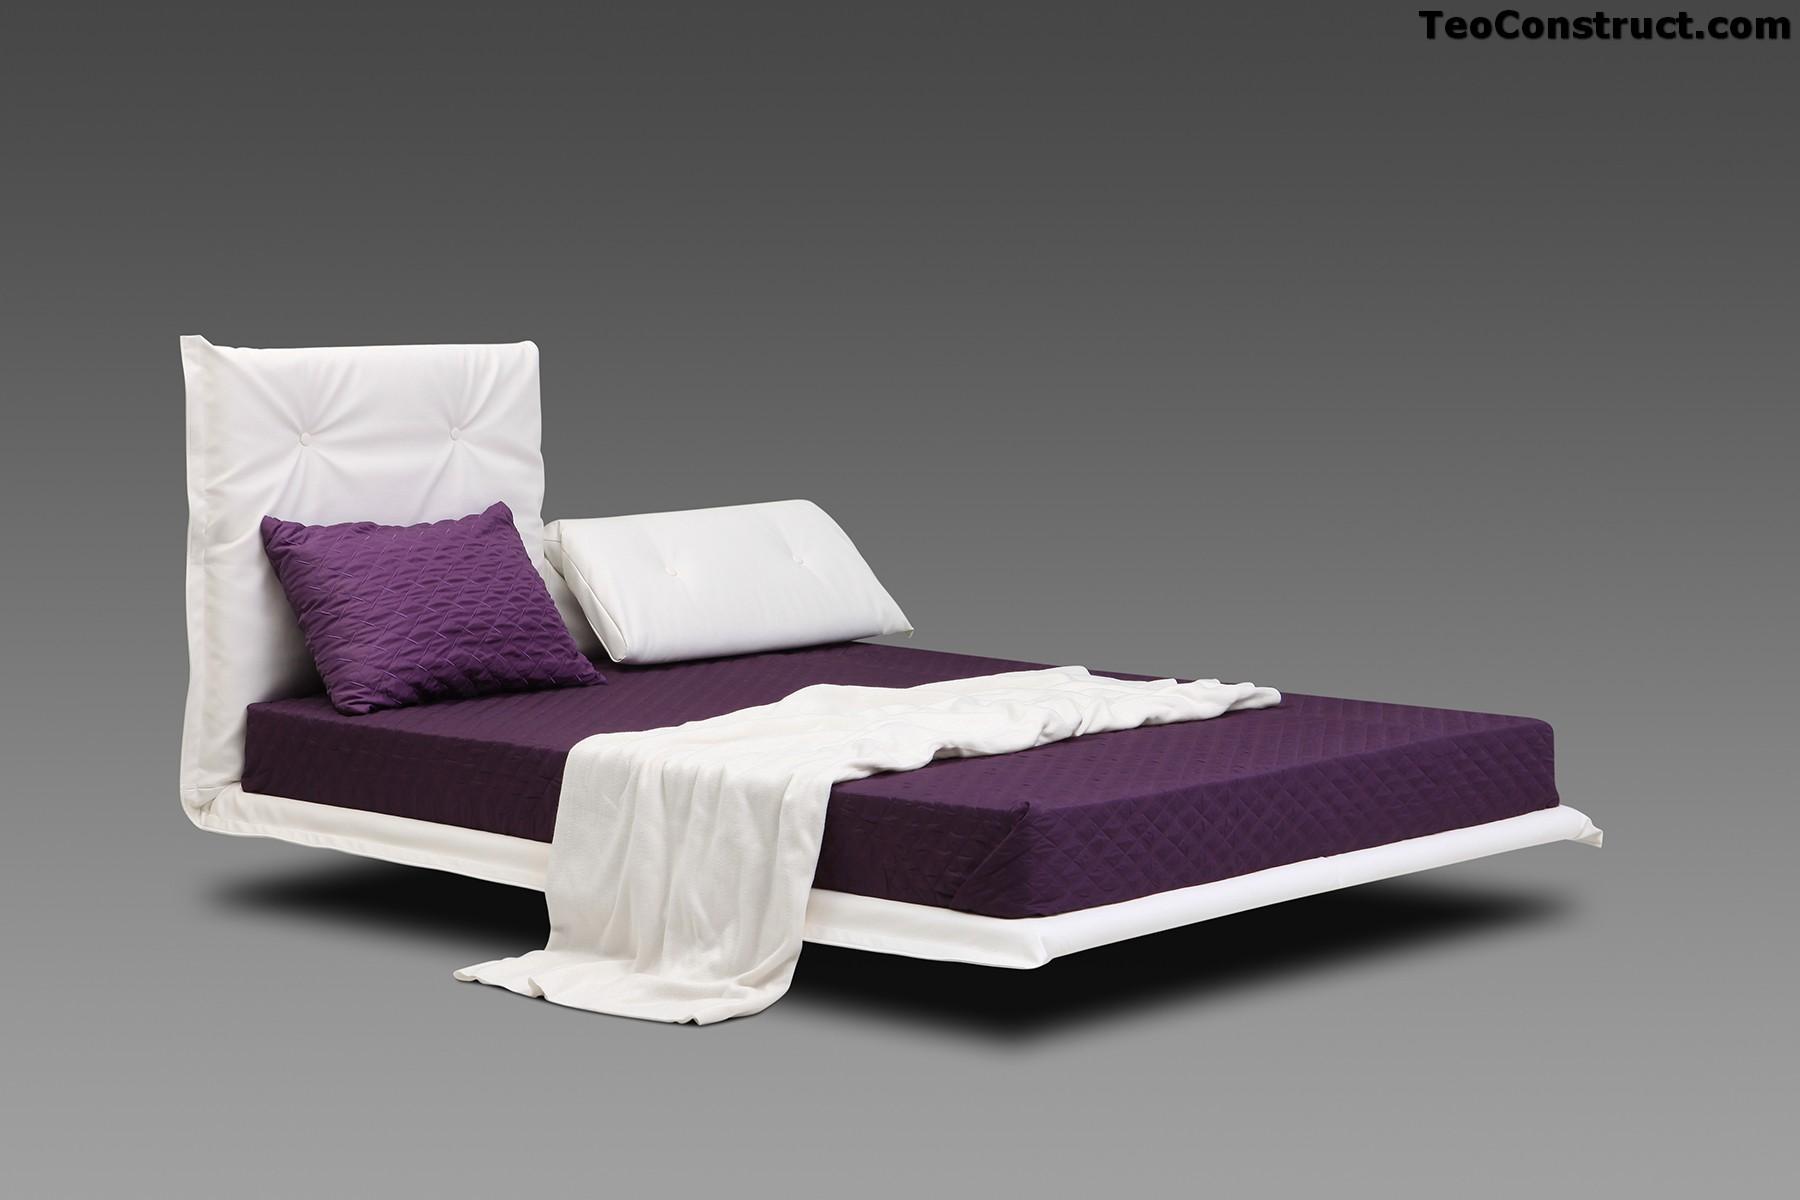 Set dormitor Bella de calitate superioara04